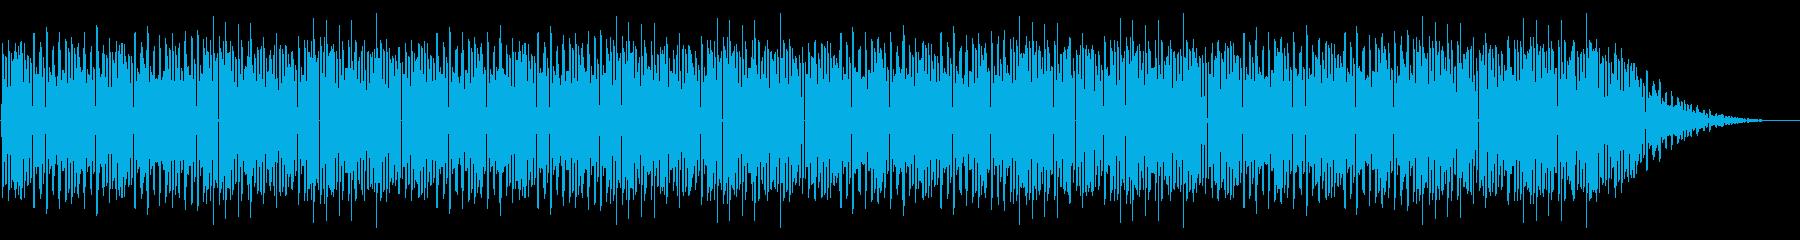 GB風アクションゲームのボス曲の再生済みの波形